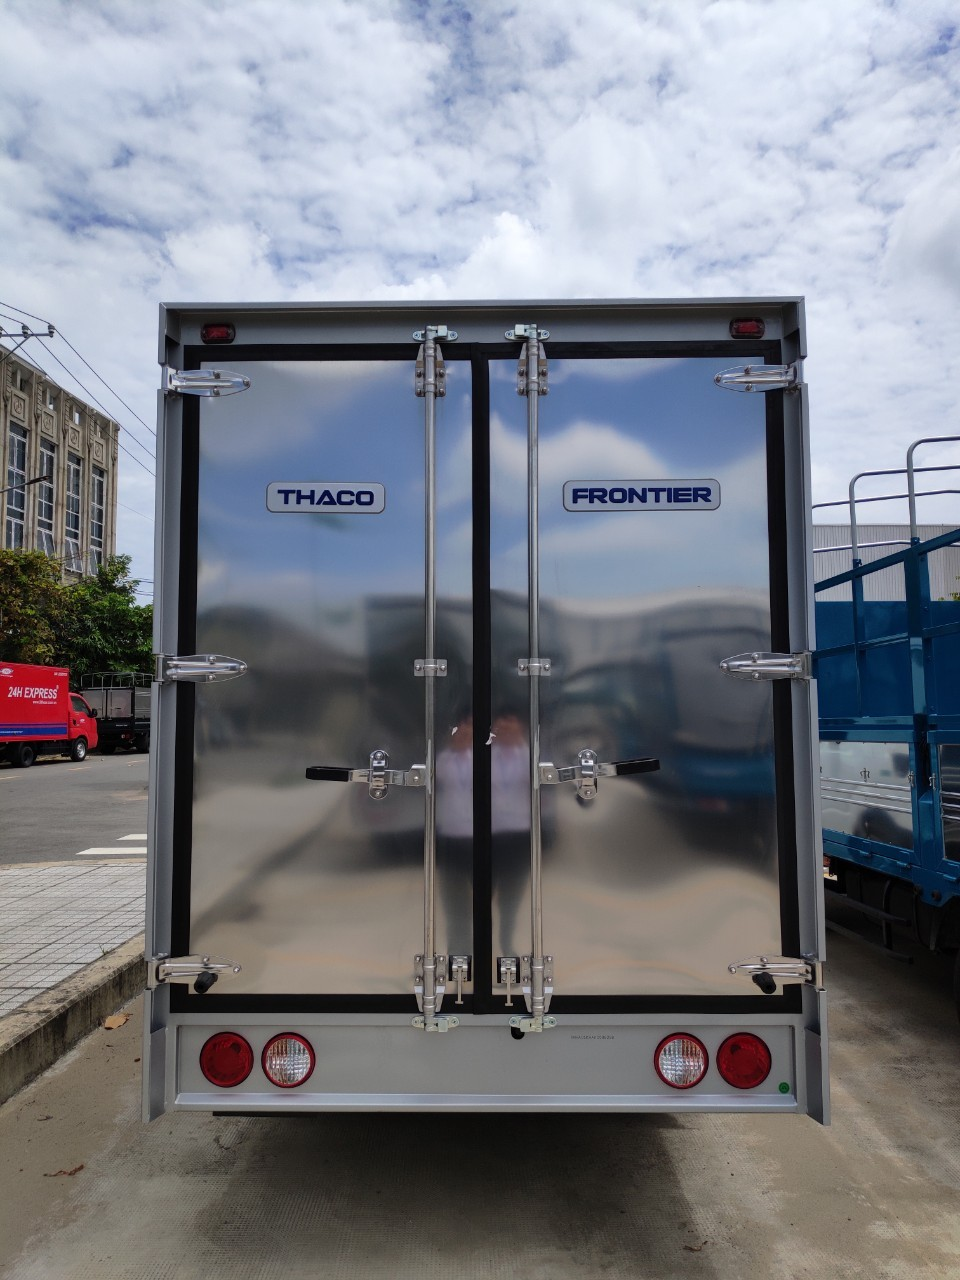 Xe tải Kia 1 tấn 4 - 1 tấn 9 - Hỗ trợ vay 70% - LH: 0938.802.127